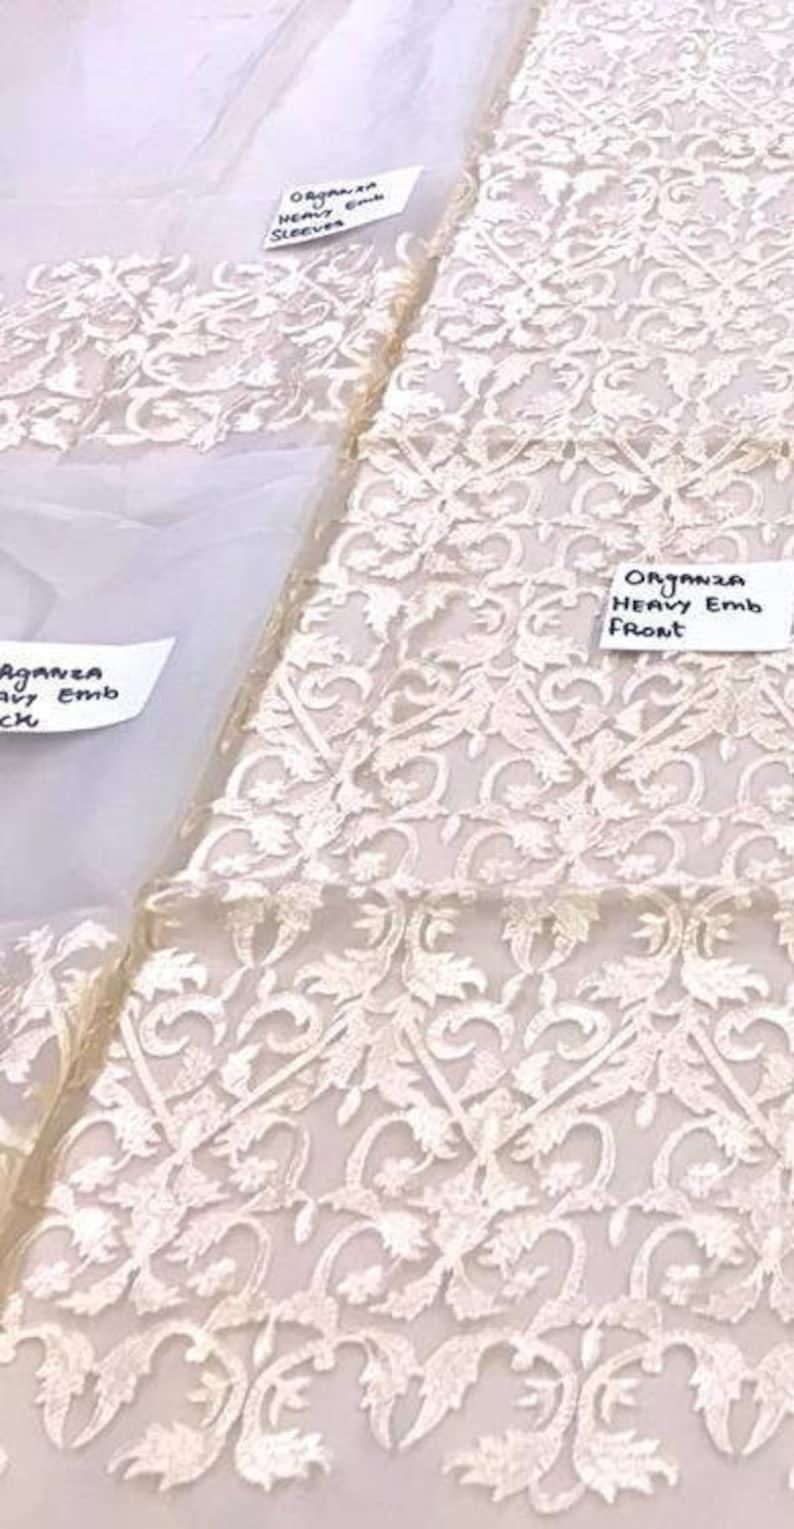 custom stitched embroidered salwar kameez kurti shirt trouser Pakistani Indian Bengali desi Eid Party desi wedding 3 Piece eastern Dress